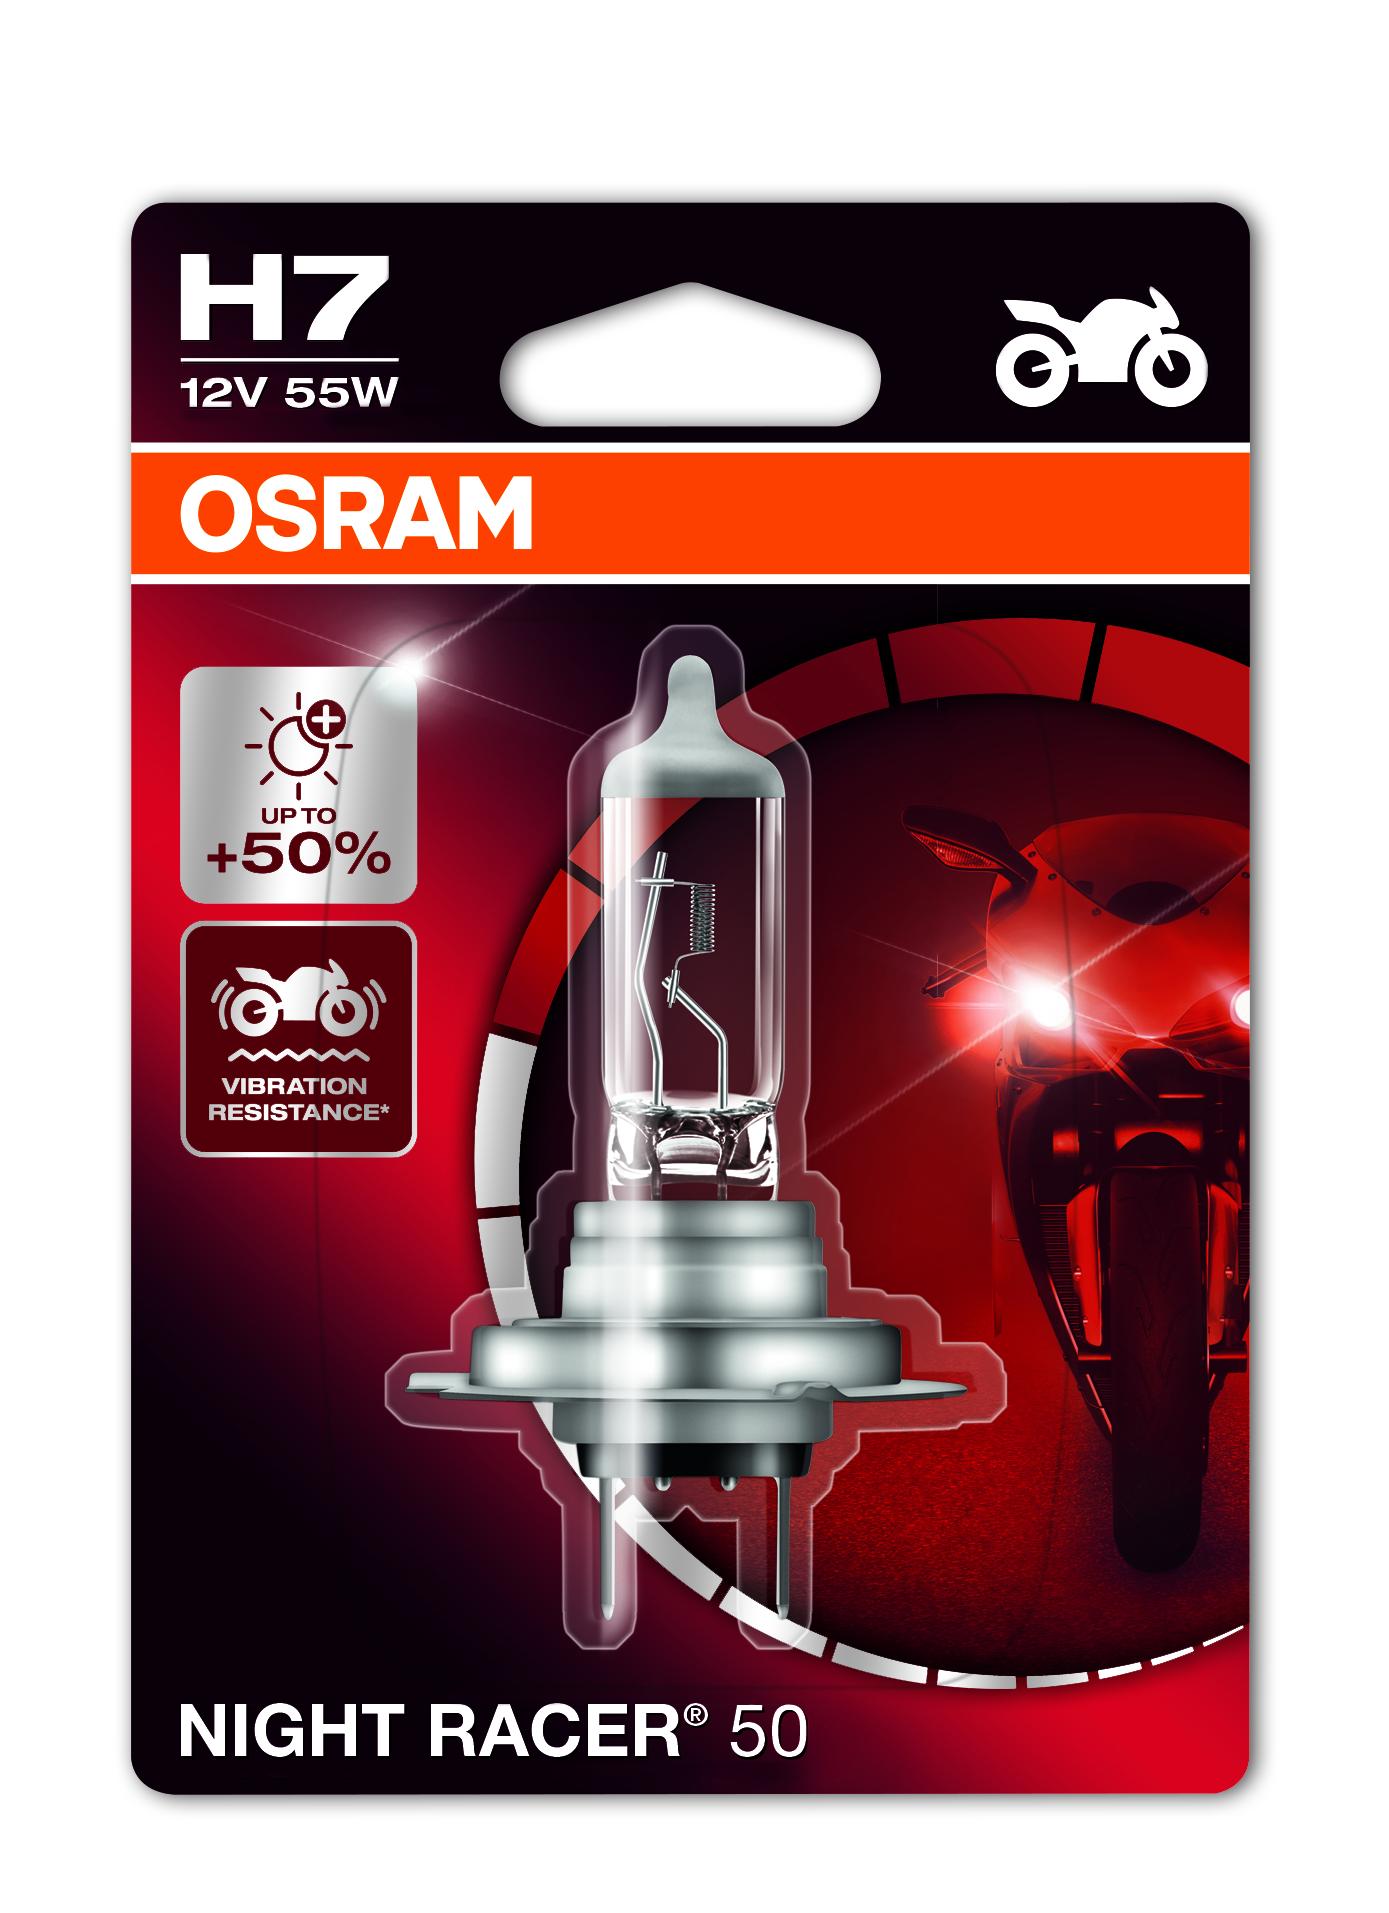 Osram halogenová žárovka, MOTO Night Racer 50, H7, PX26d, 12V, 55W, 64210NR5-01B